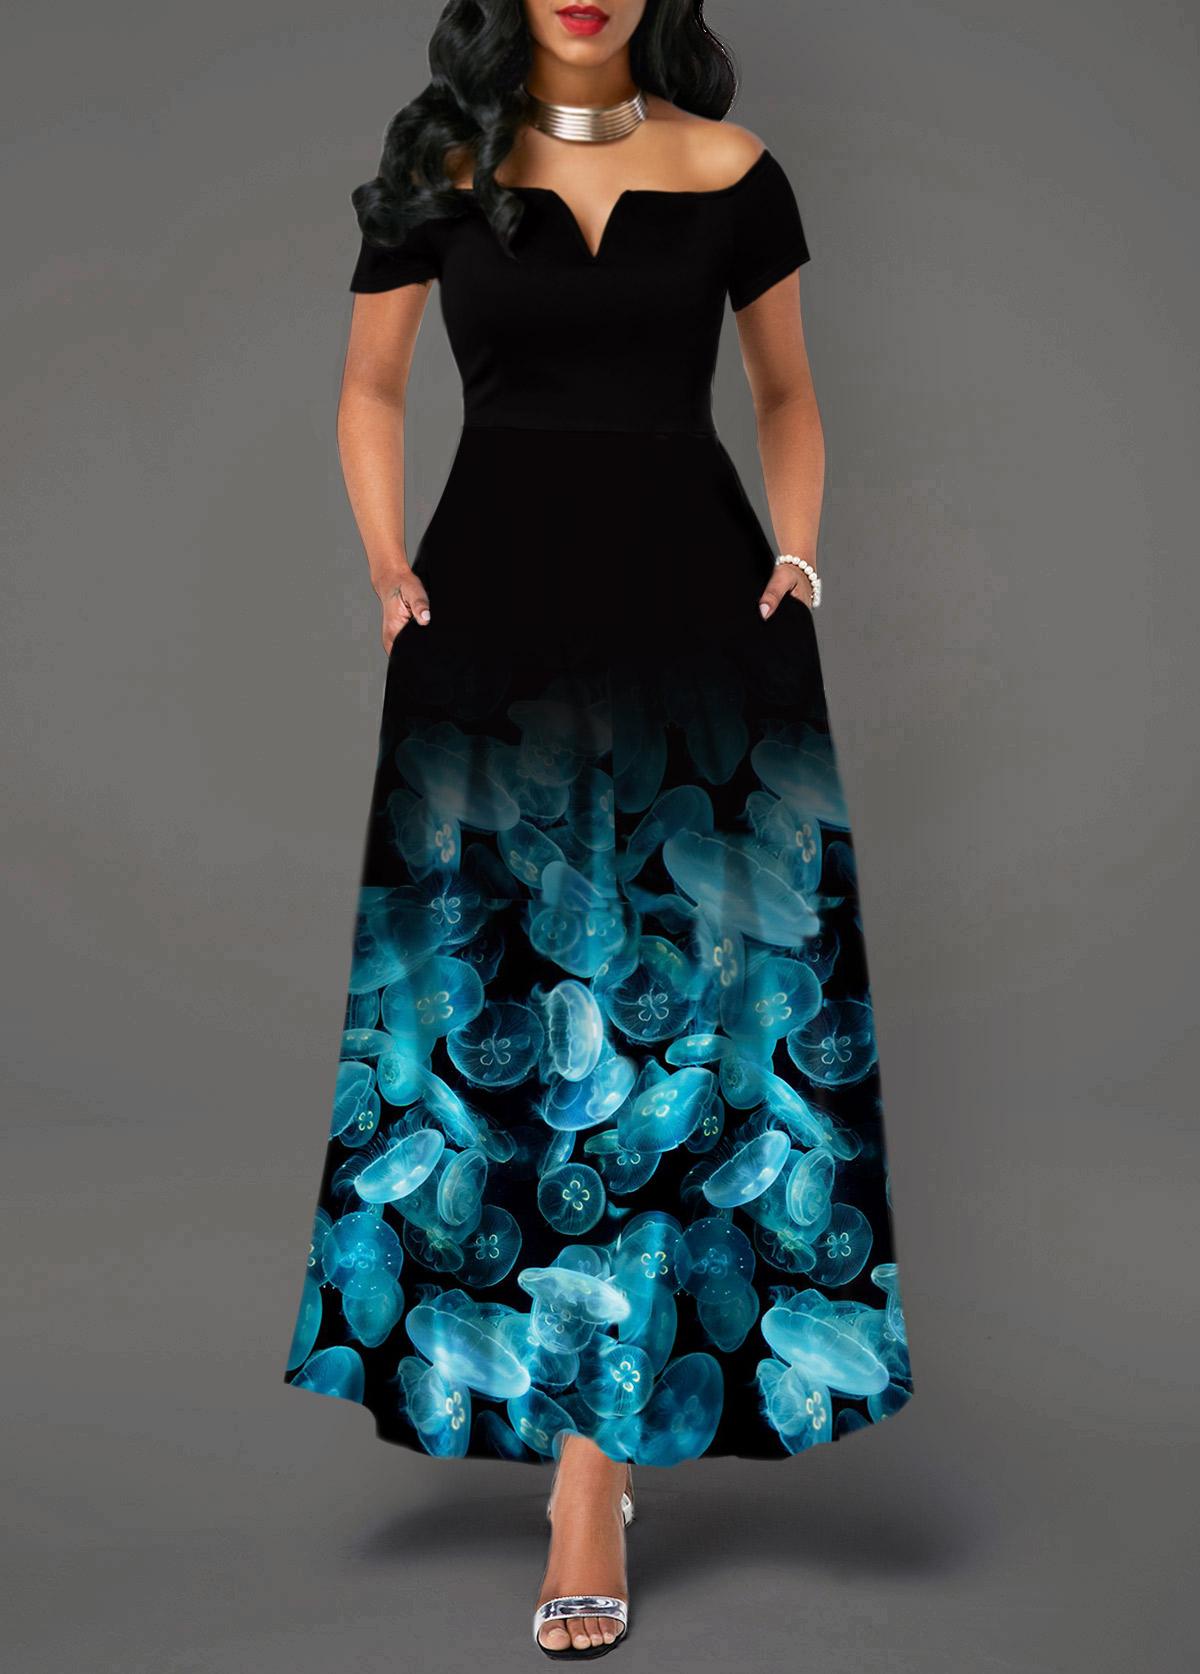 Printed Off the Shoulder High Waist Dress